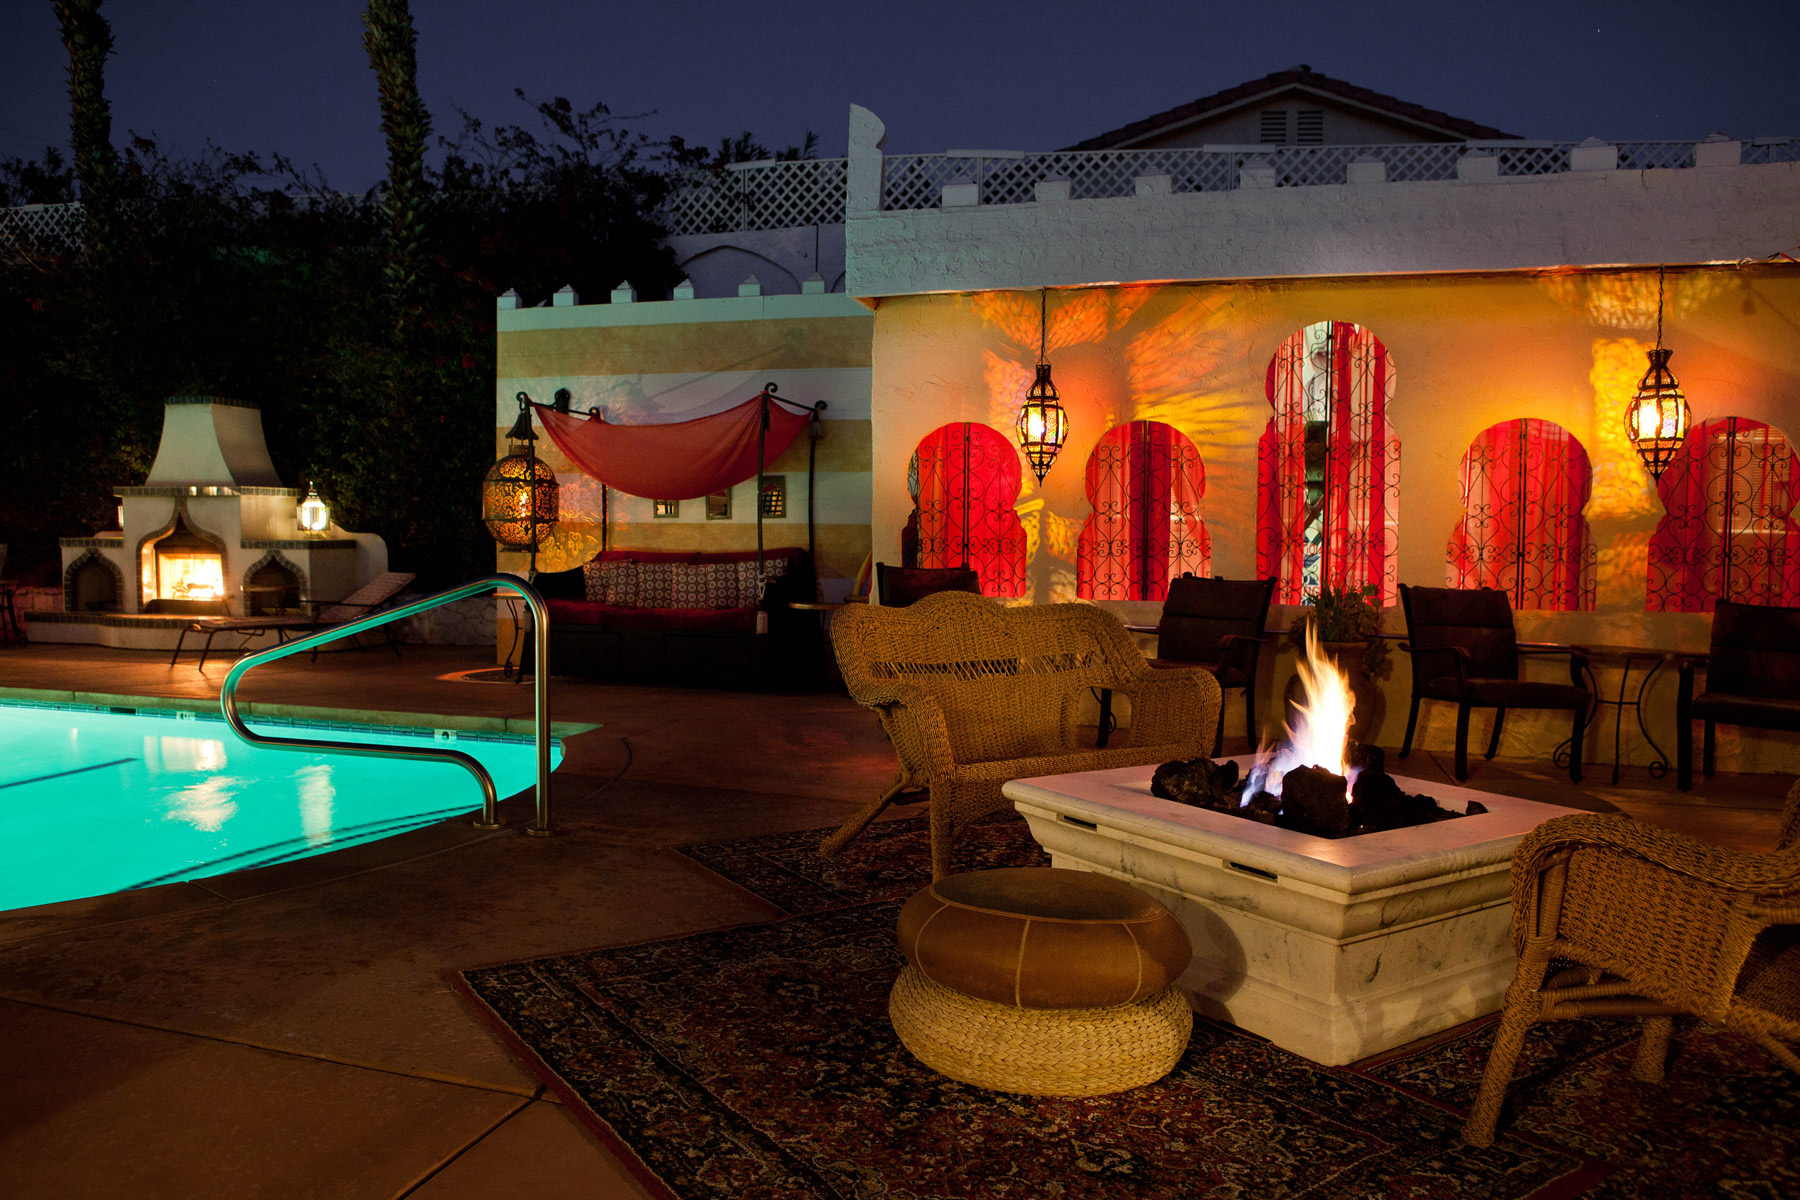 Hot Water' Guide to Desert Hot Springs: Hot Springs in Palm Springs